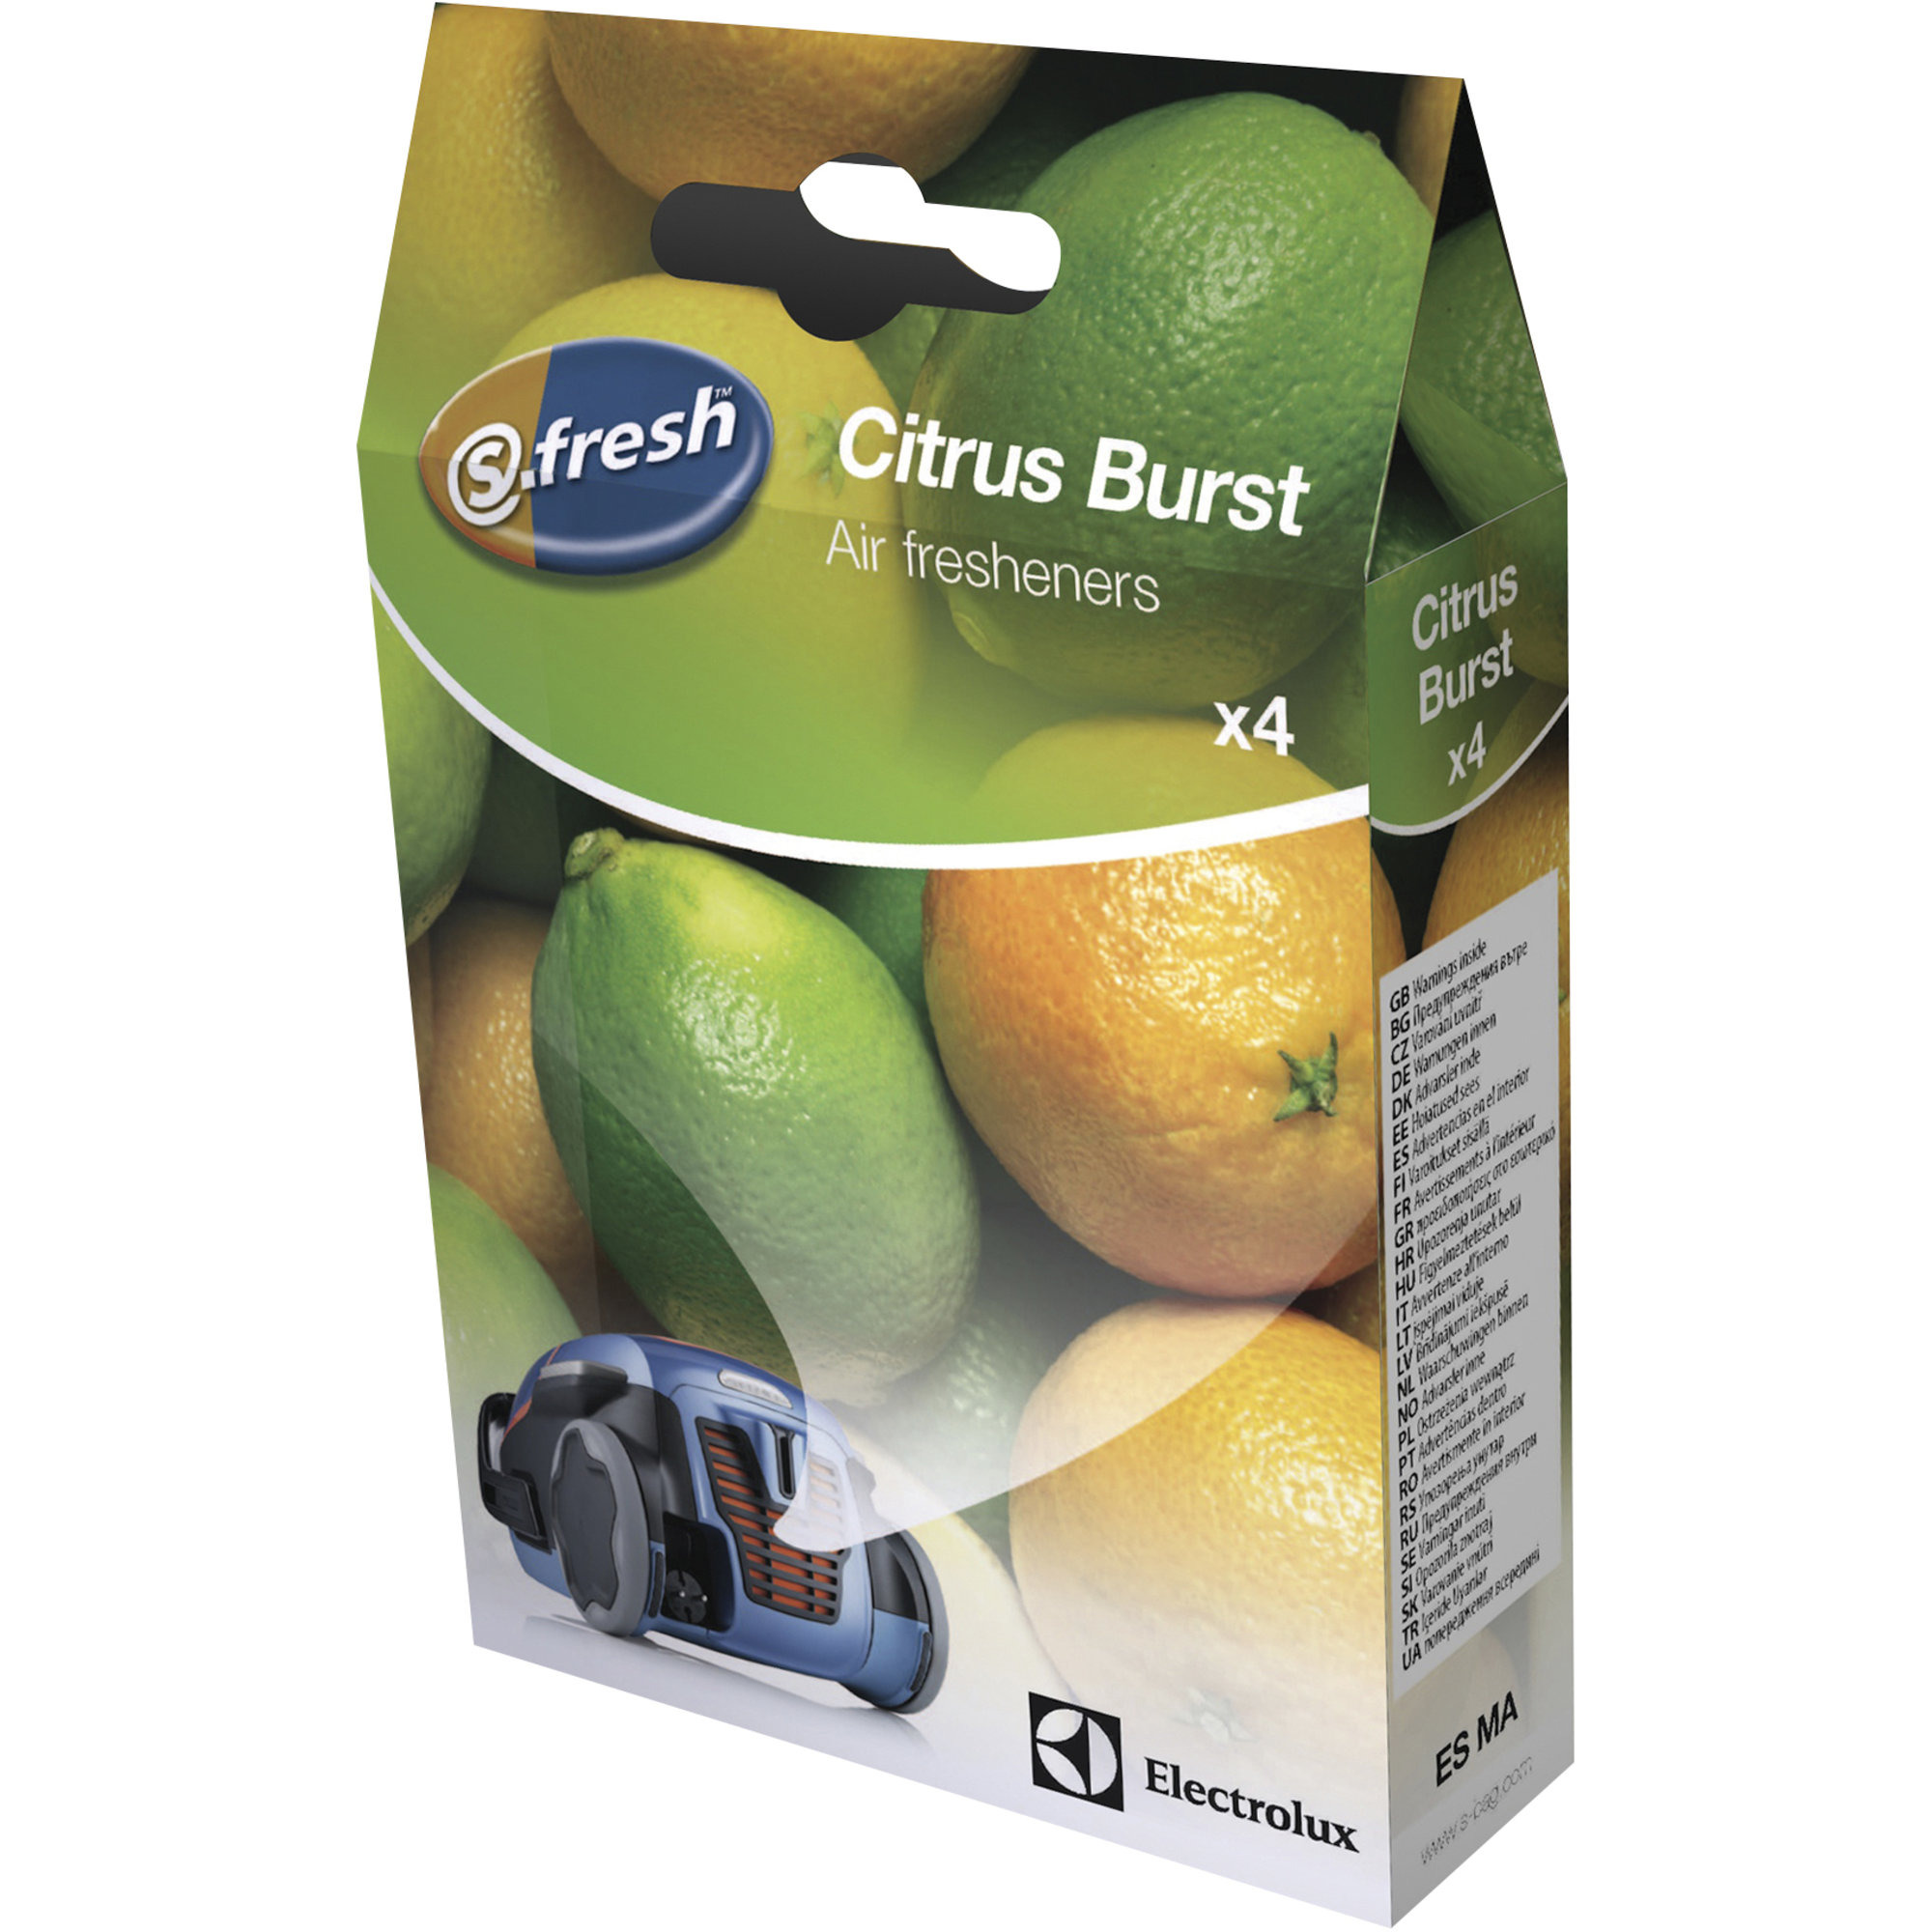 Electrolux S-fresh doftkulor till dammsugare – Citrus burst